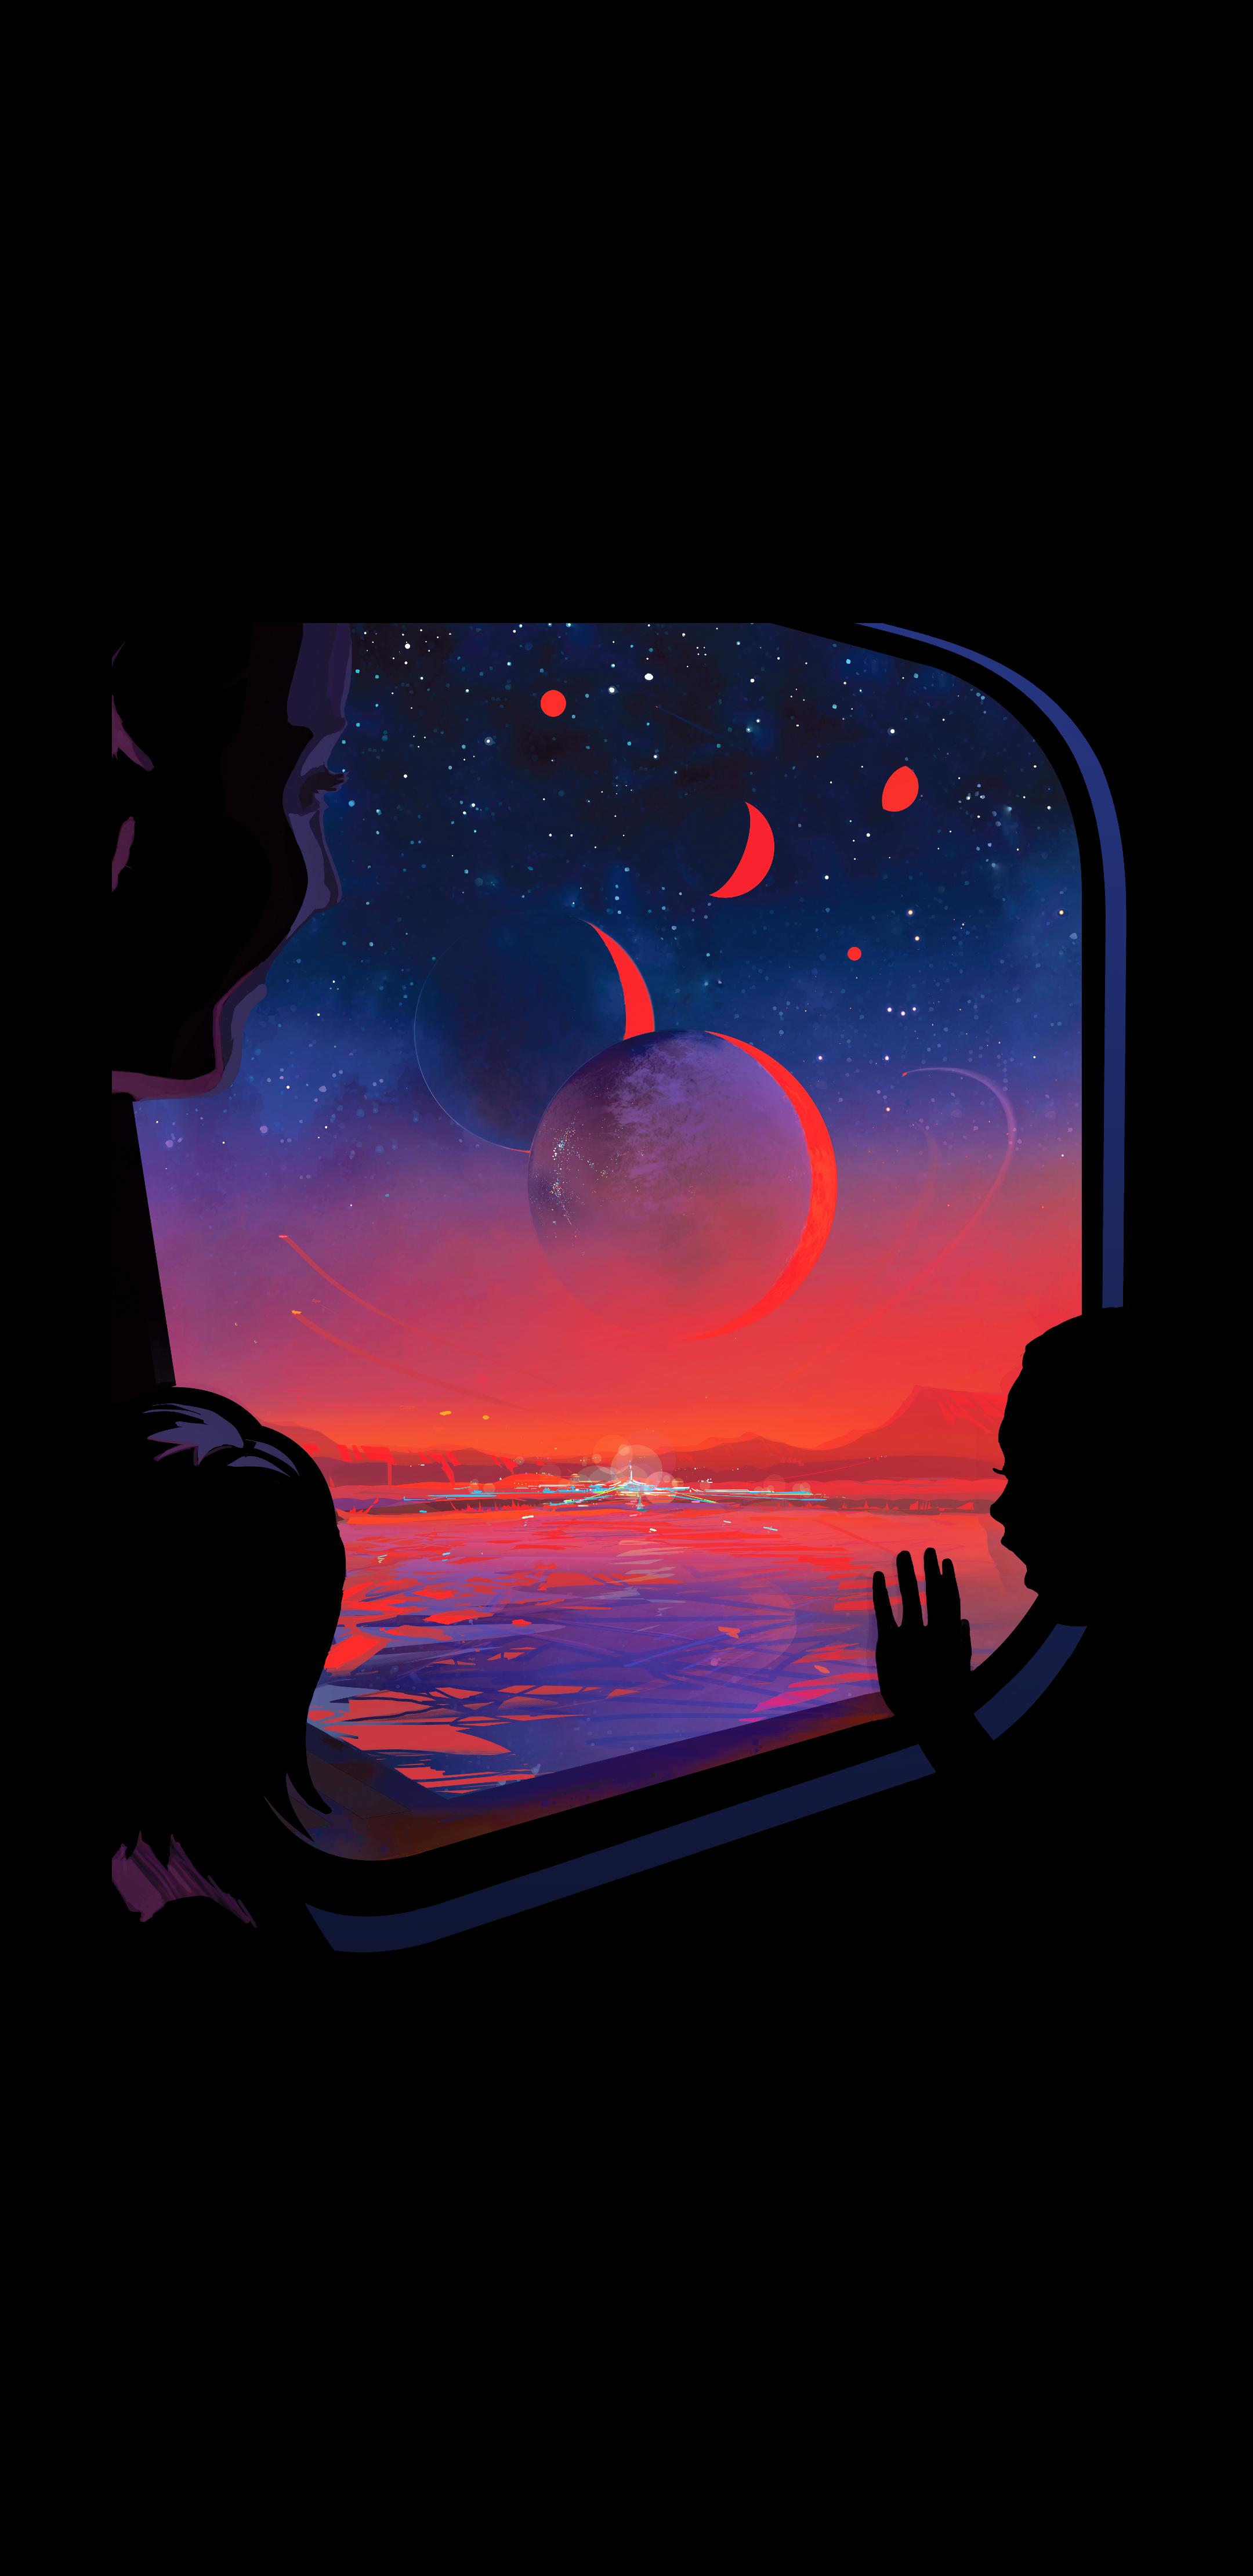 Trappist 1e Nasa Poster 2160x4440 Imgur Cool Backgrounds For Iphone Samsung Galaxy Wallpaper Nasa Wallpaper